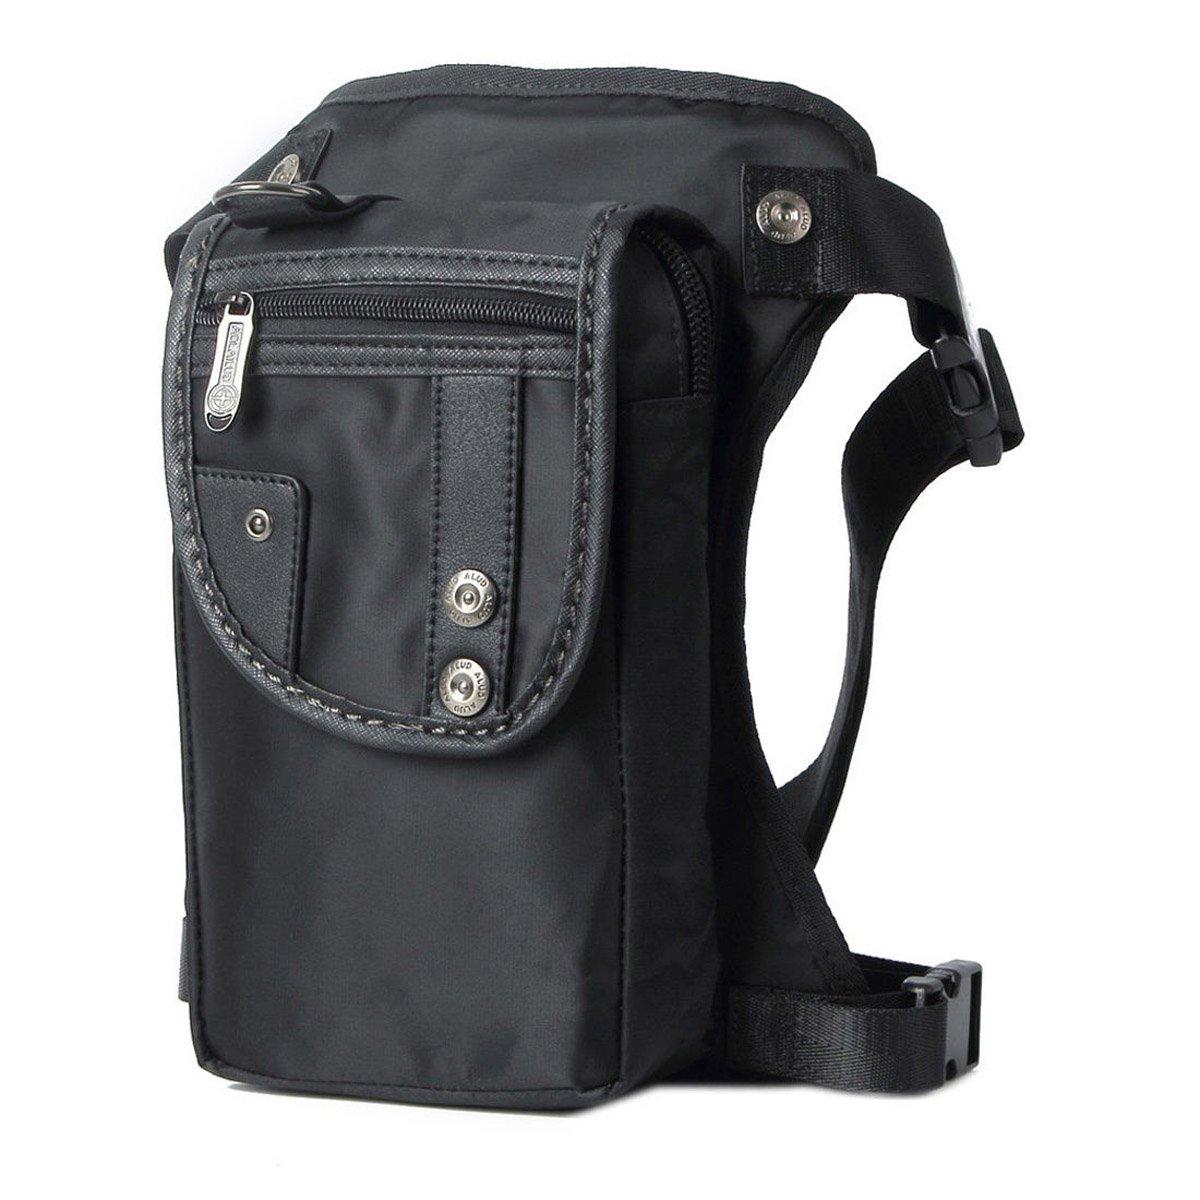 Anjoy Drop Leg Bag Fanny Waist Packs Motorcycle Steampunk Costume Outdoor Tatical Black ebest